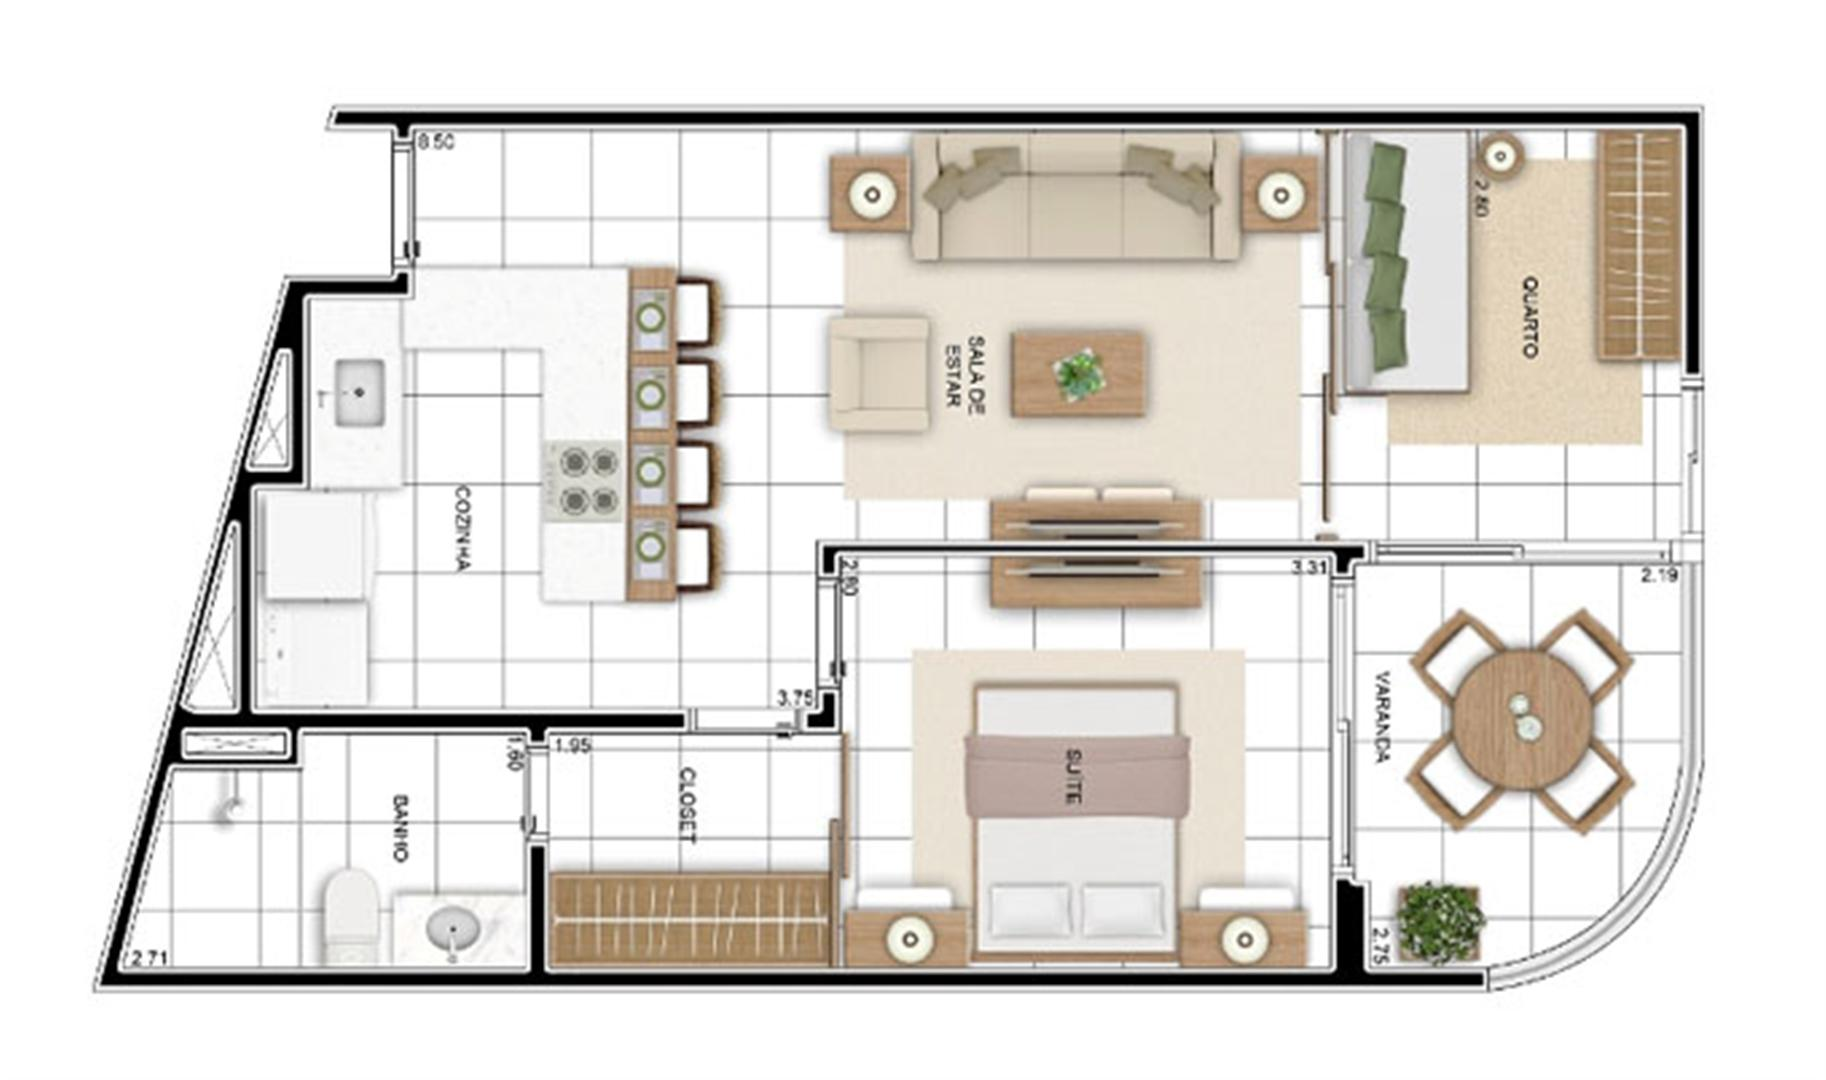 PLANTA - APTO TIPO C - 56 m² OPÇÃO TIPO  | In Mare Bali – Apartamento no  Distrito Litoral de Cotovelo - Parnamirim - Rio Grande do Norte